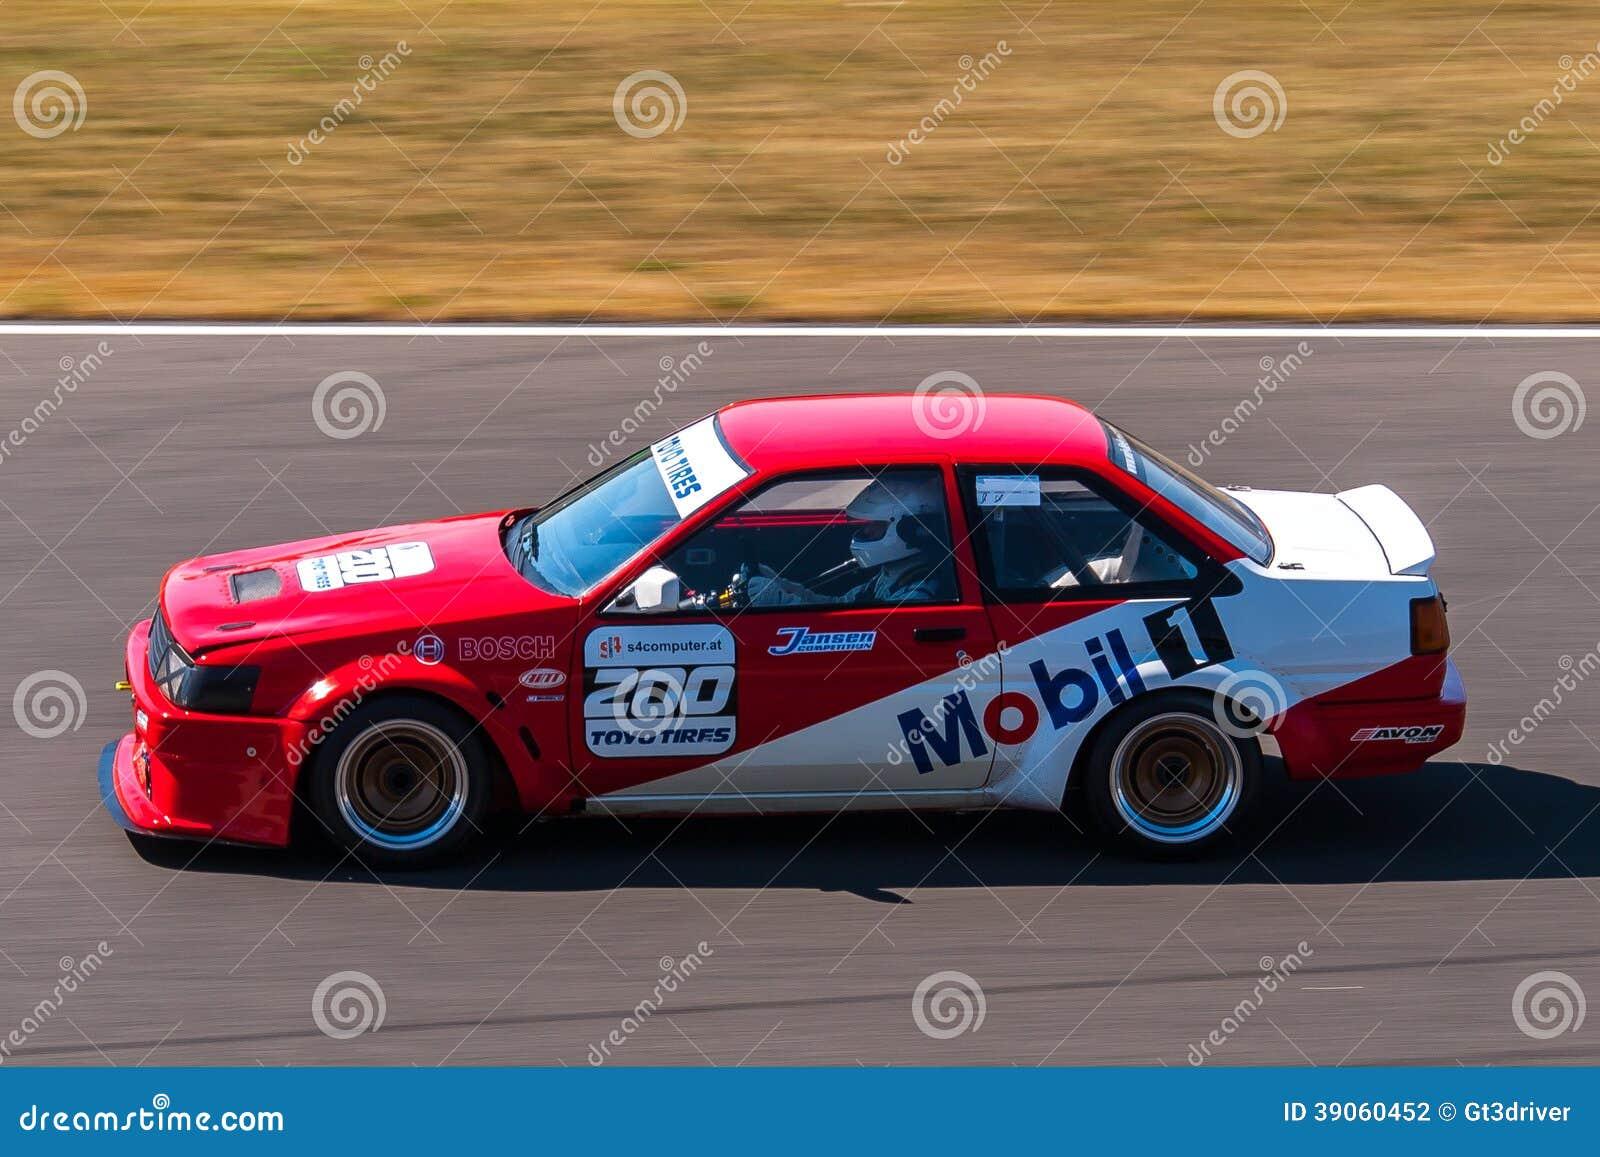 Toyota Corolla AE86 Race Car Editorial Photography - Image: 39060452